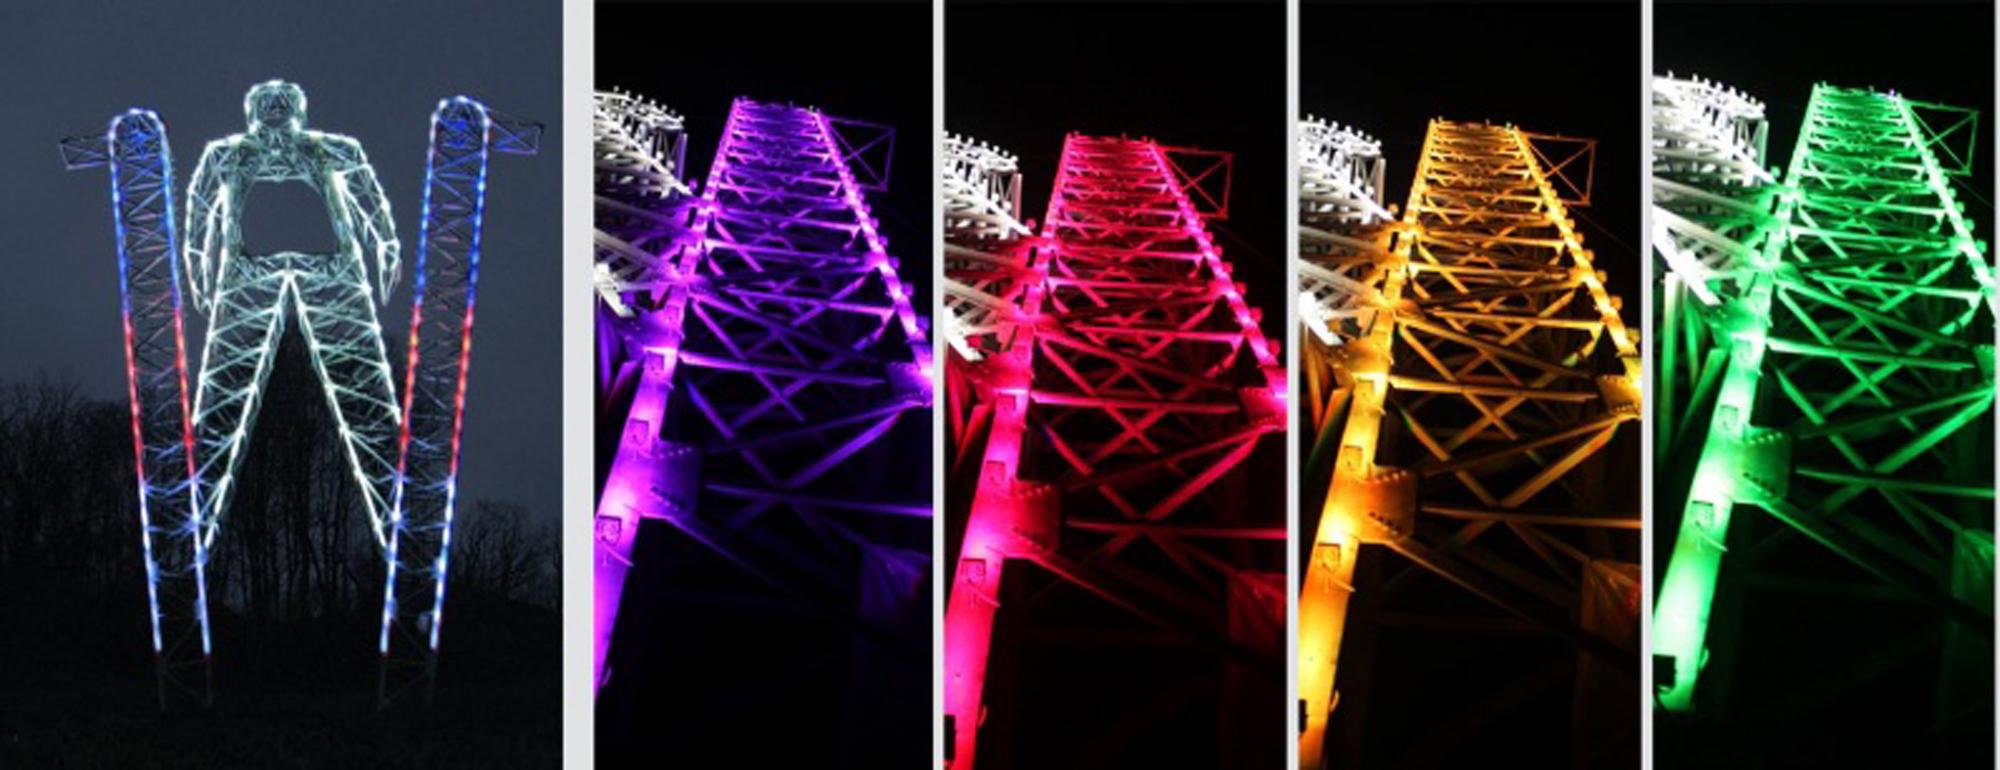 Sochi Skier, lighting stage